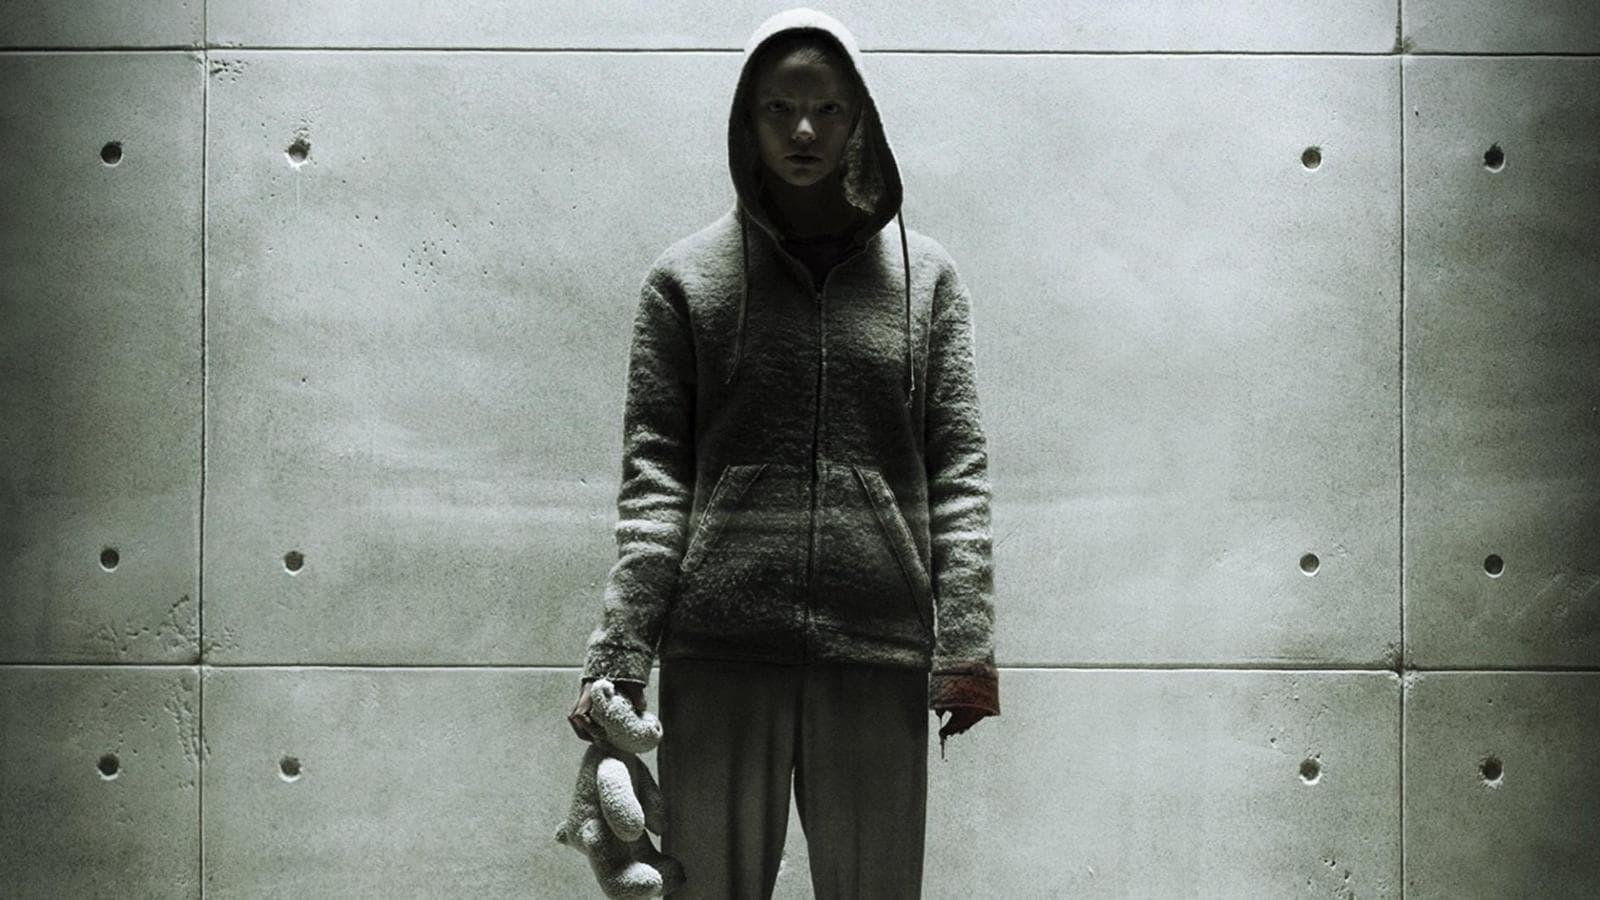 Morgan il thriller horror fantascientifico su Rai 4 mercoledì 27 gennaio